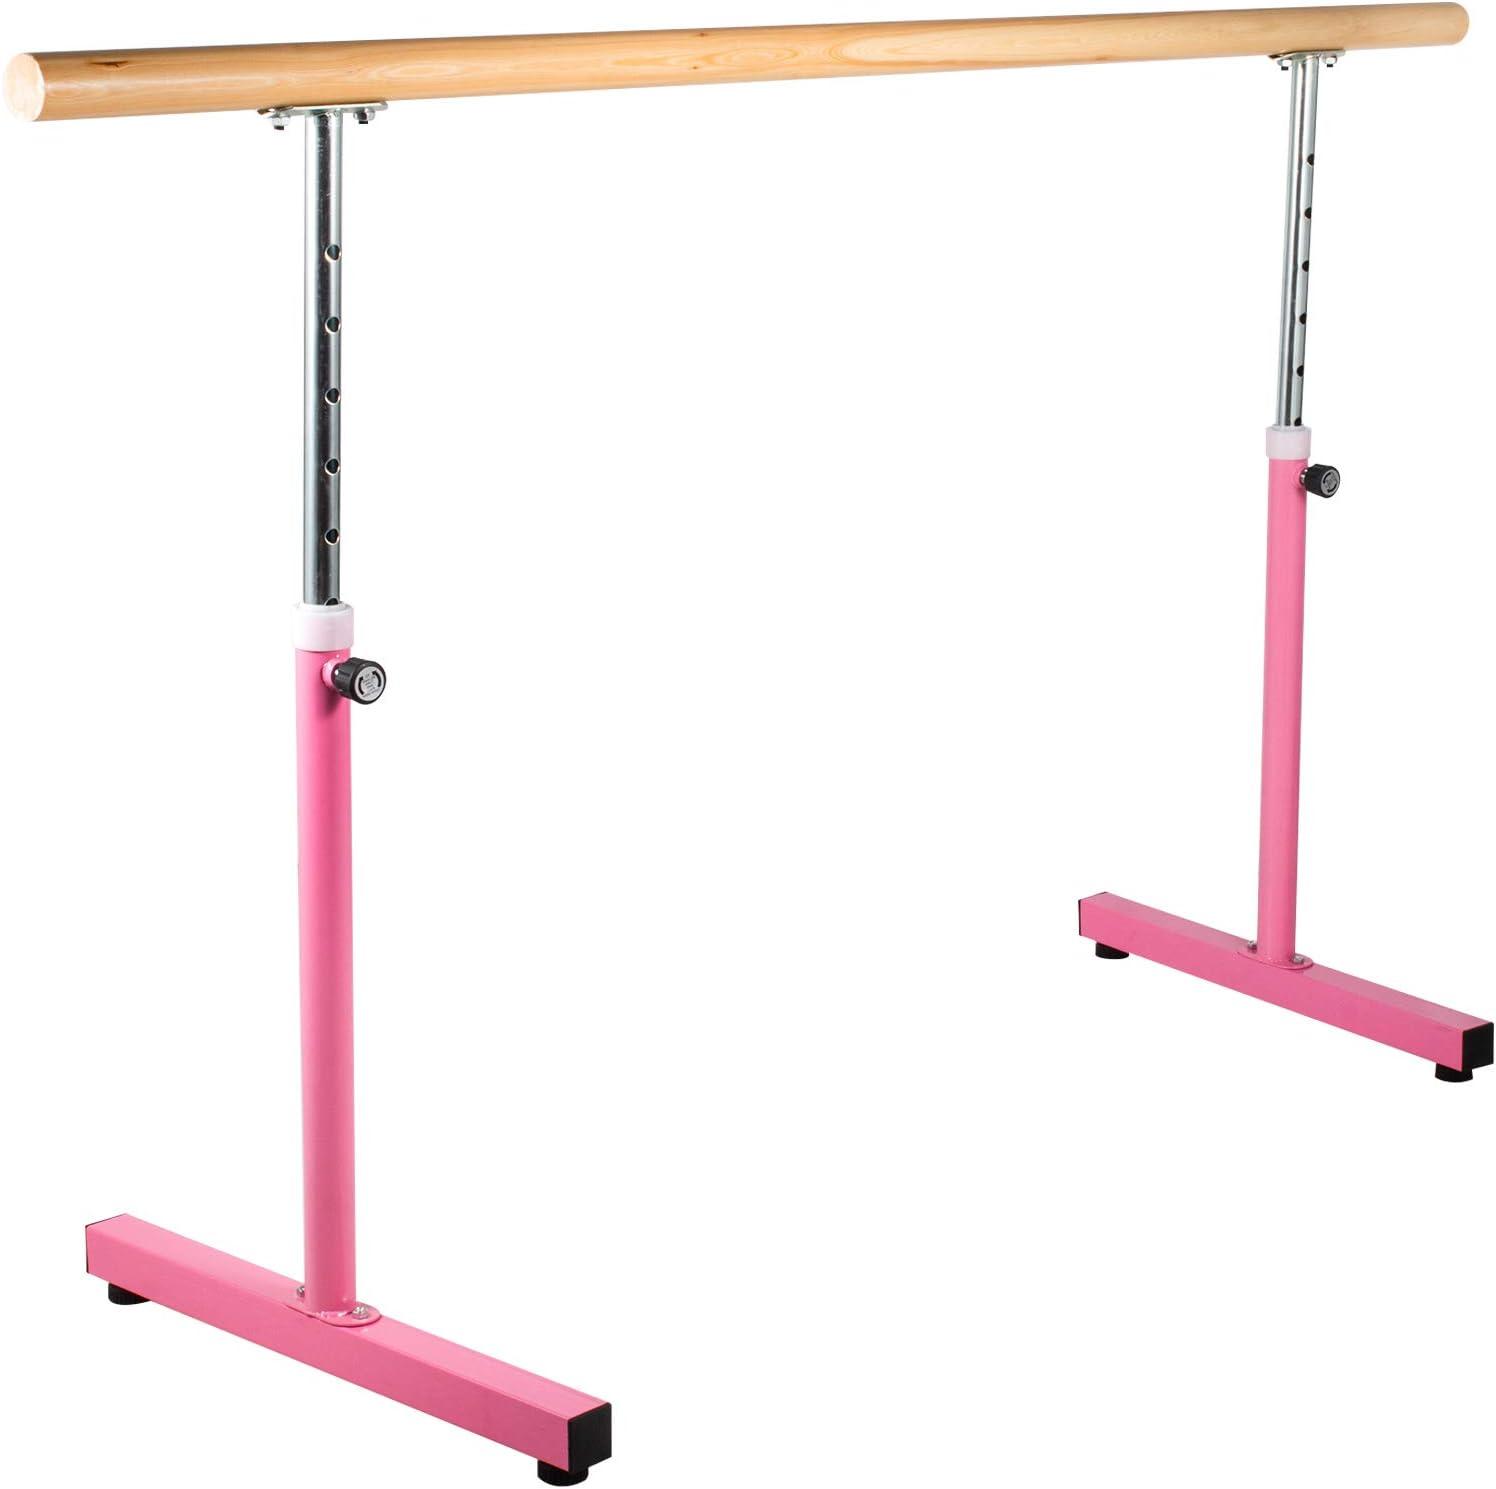 4Ft Single Bar Freestanding Ballet Barre Durable Pine Steel Exercise Stretch